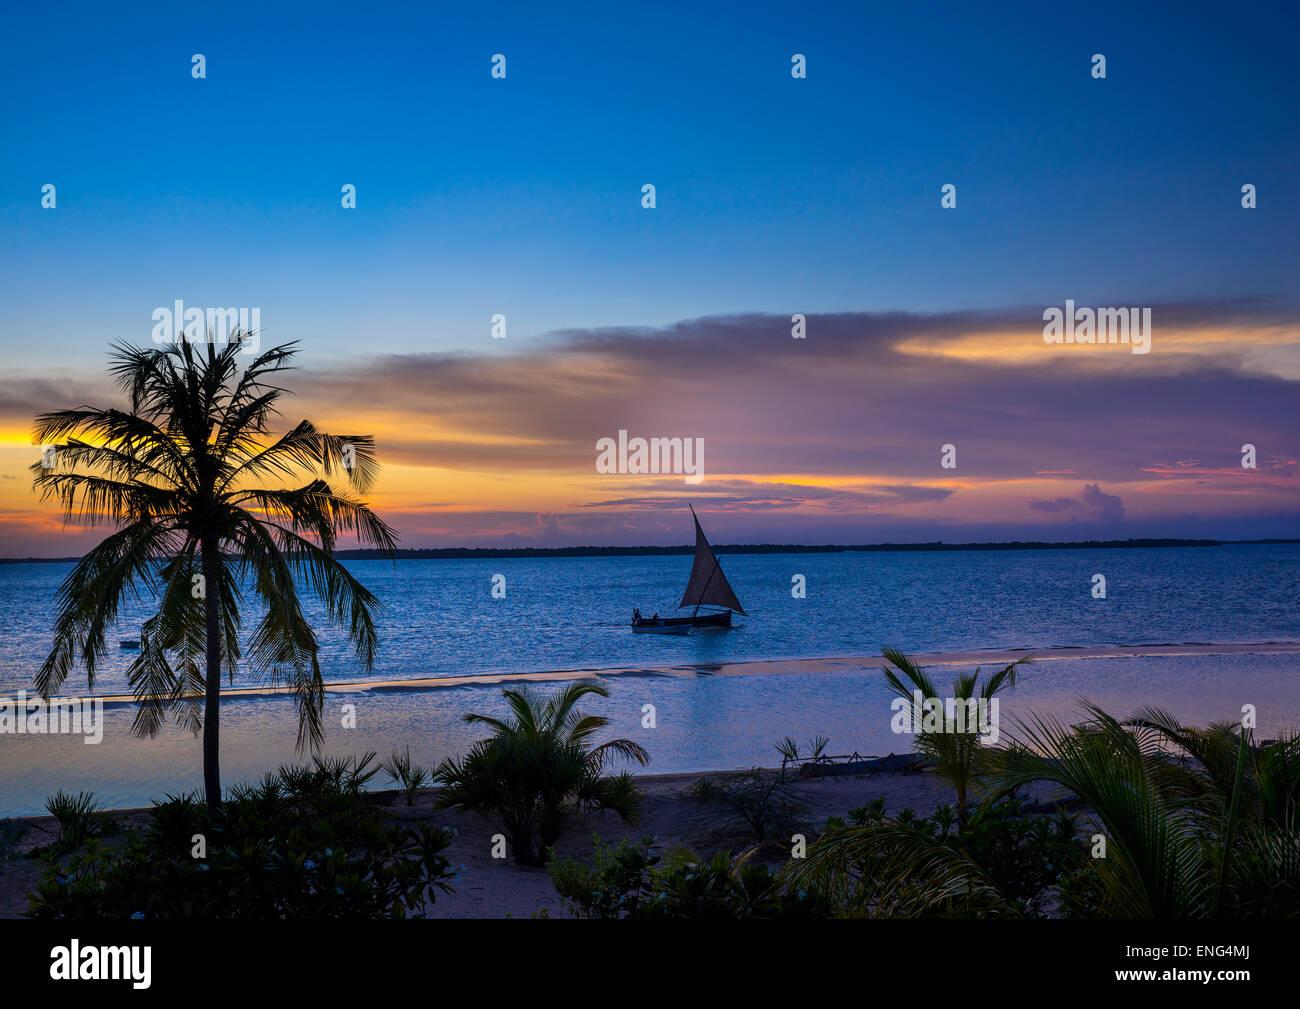 Velero en el atardecer, Condado de Lamu, Kenya, Playa Kizingoni Imagen De Stock